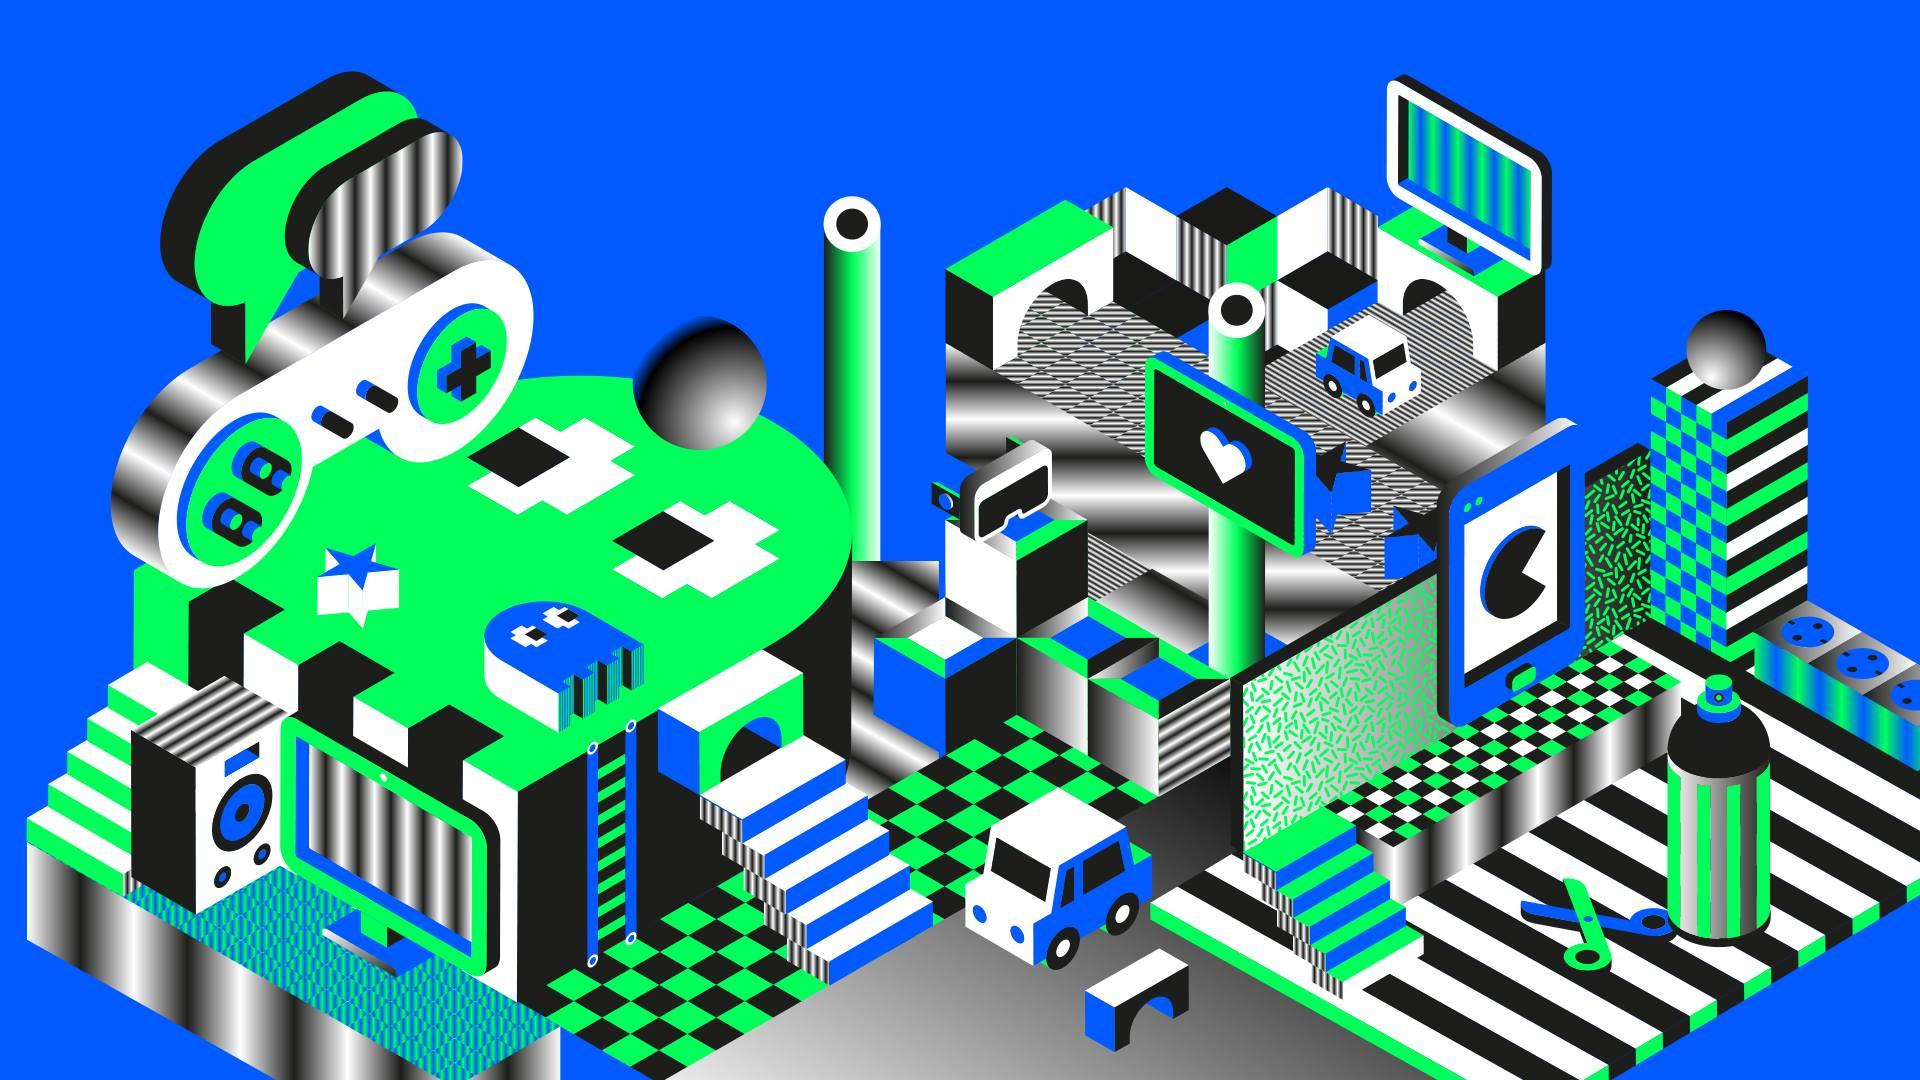 Next Level - Festival for Games 2018